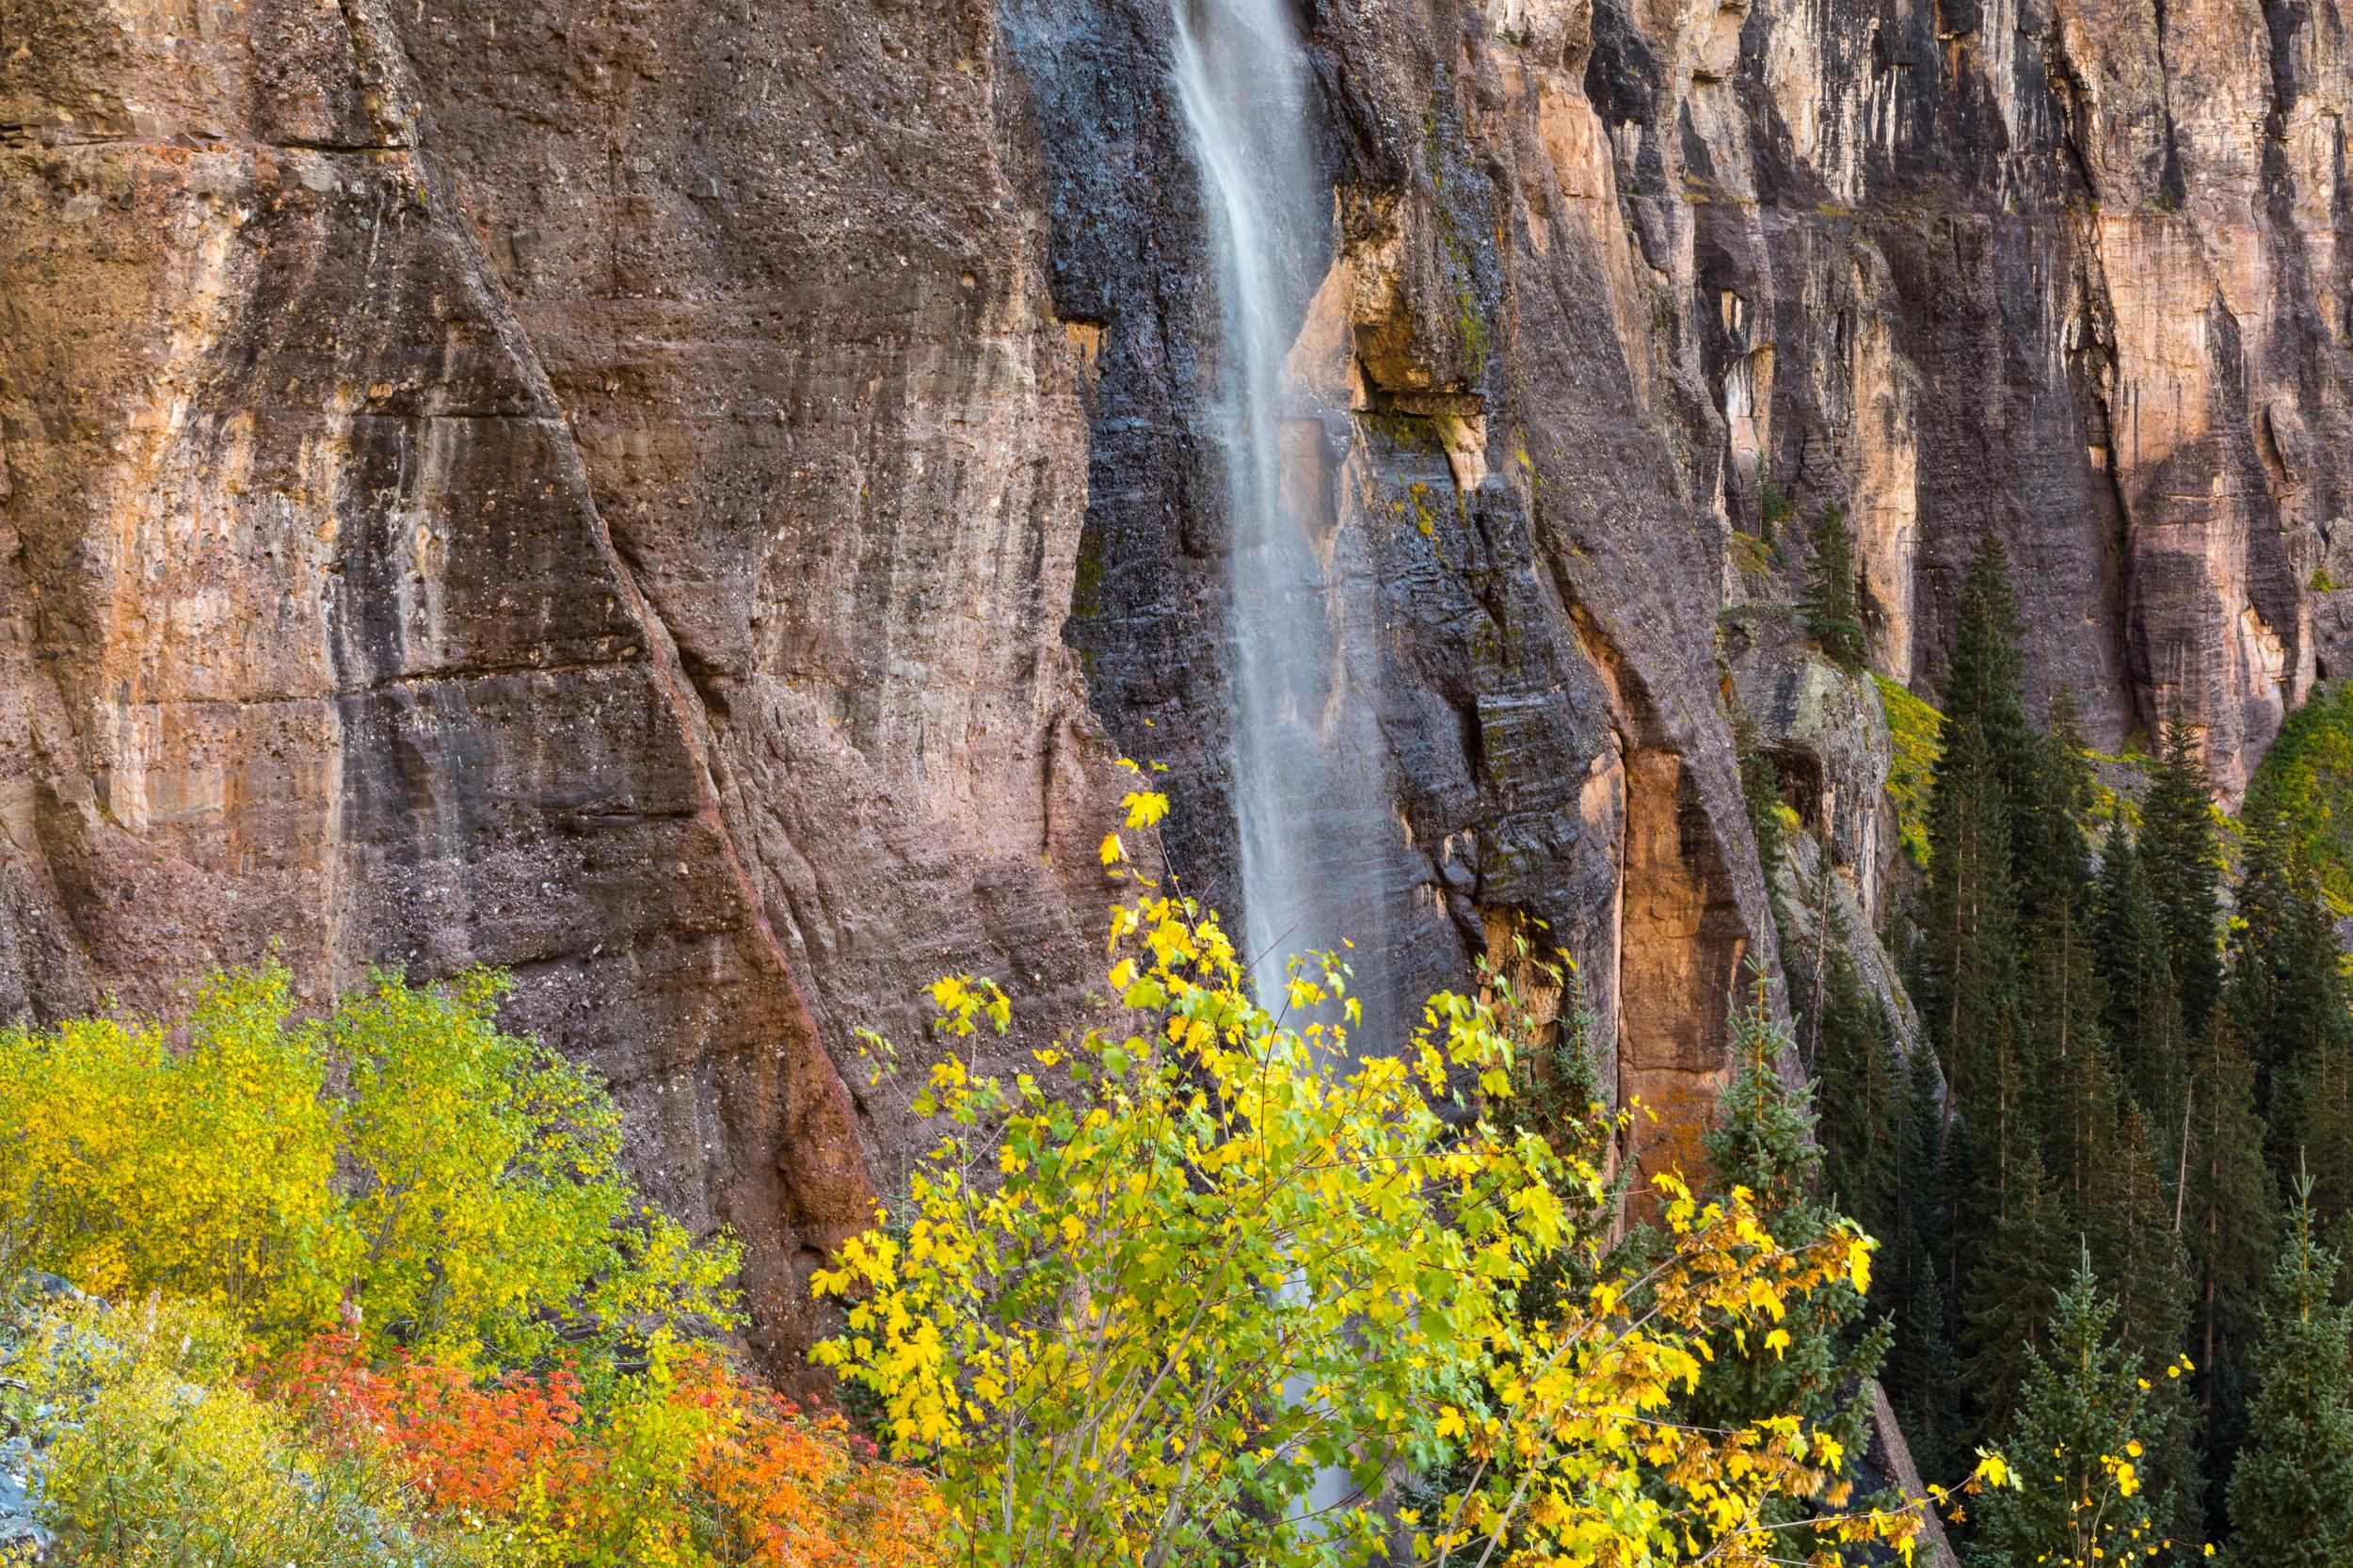 Bridal Veil Falls, Telluride, Image # 3195